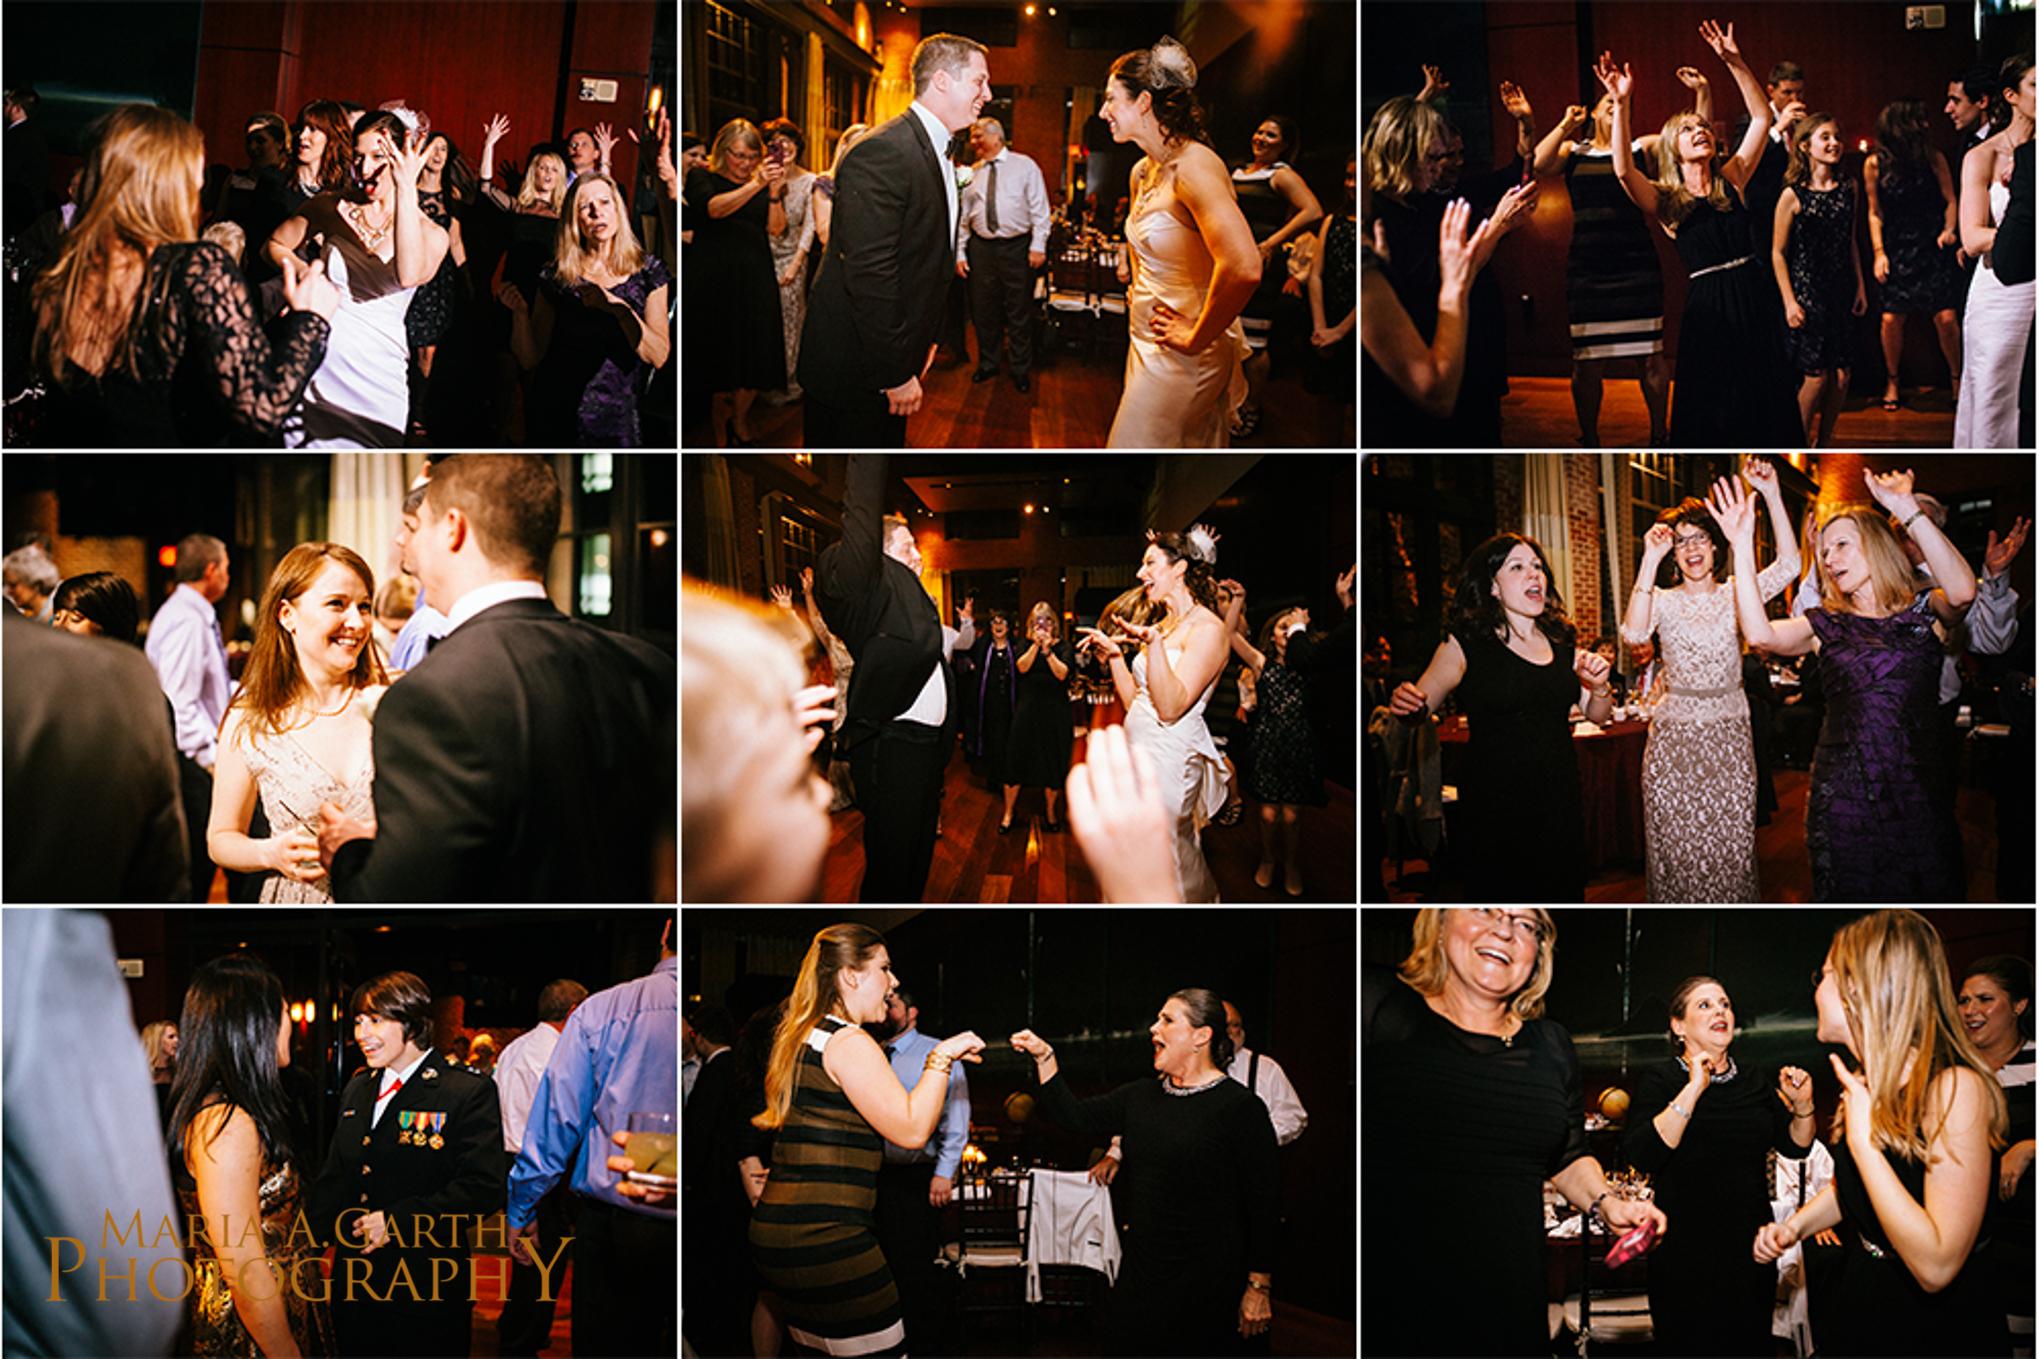 Georgetown Weddings, DC Wedding Photography, Weddings at the Ritz in DC_029.jpg